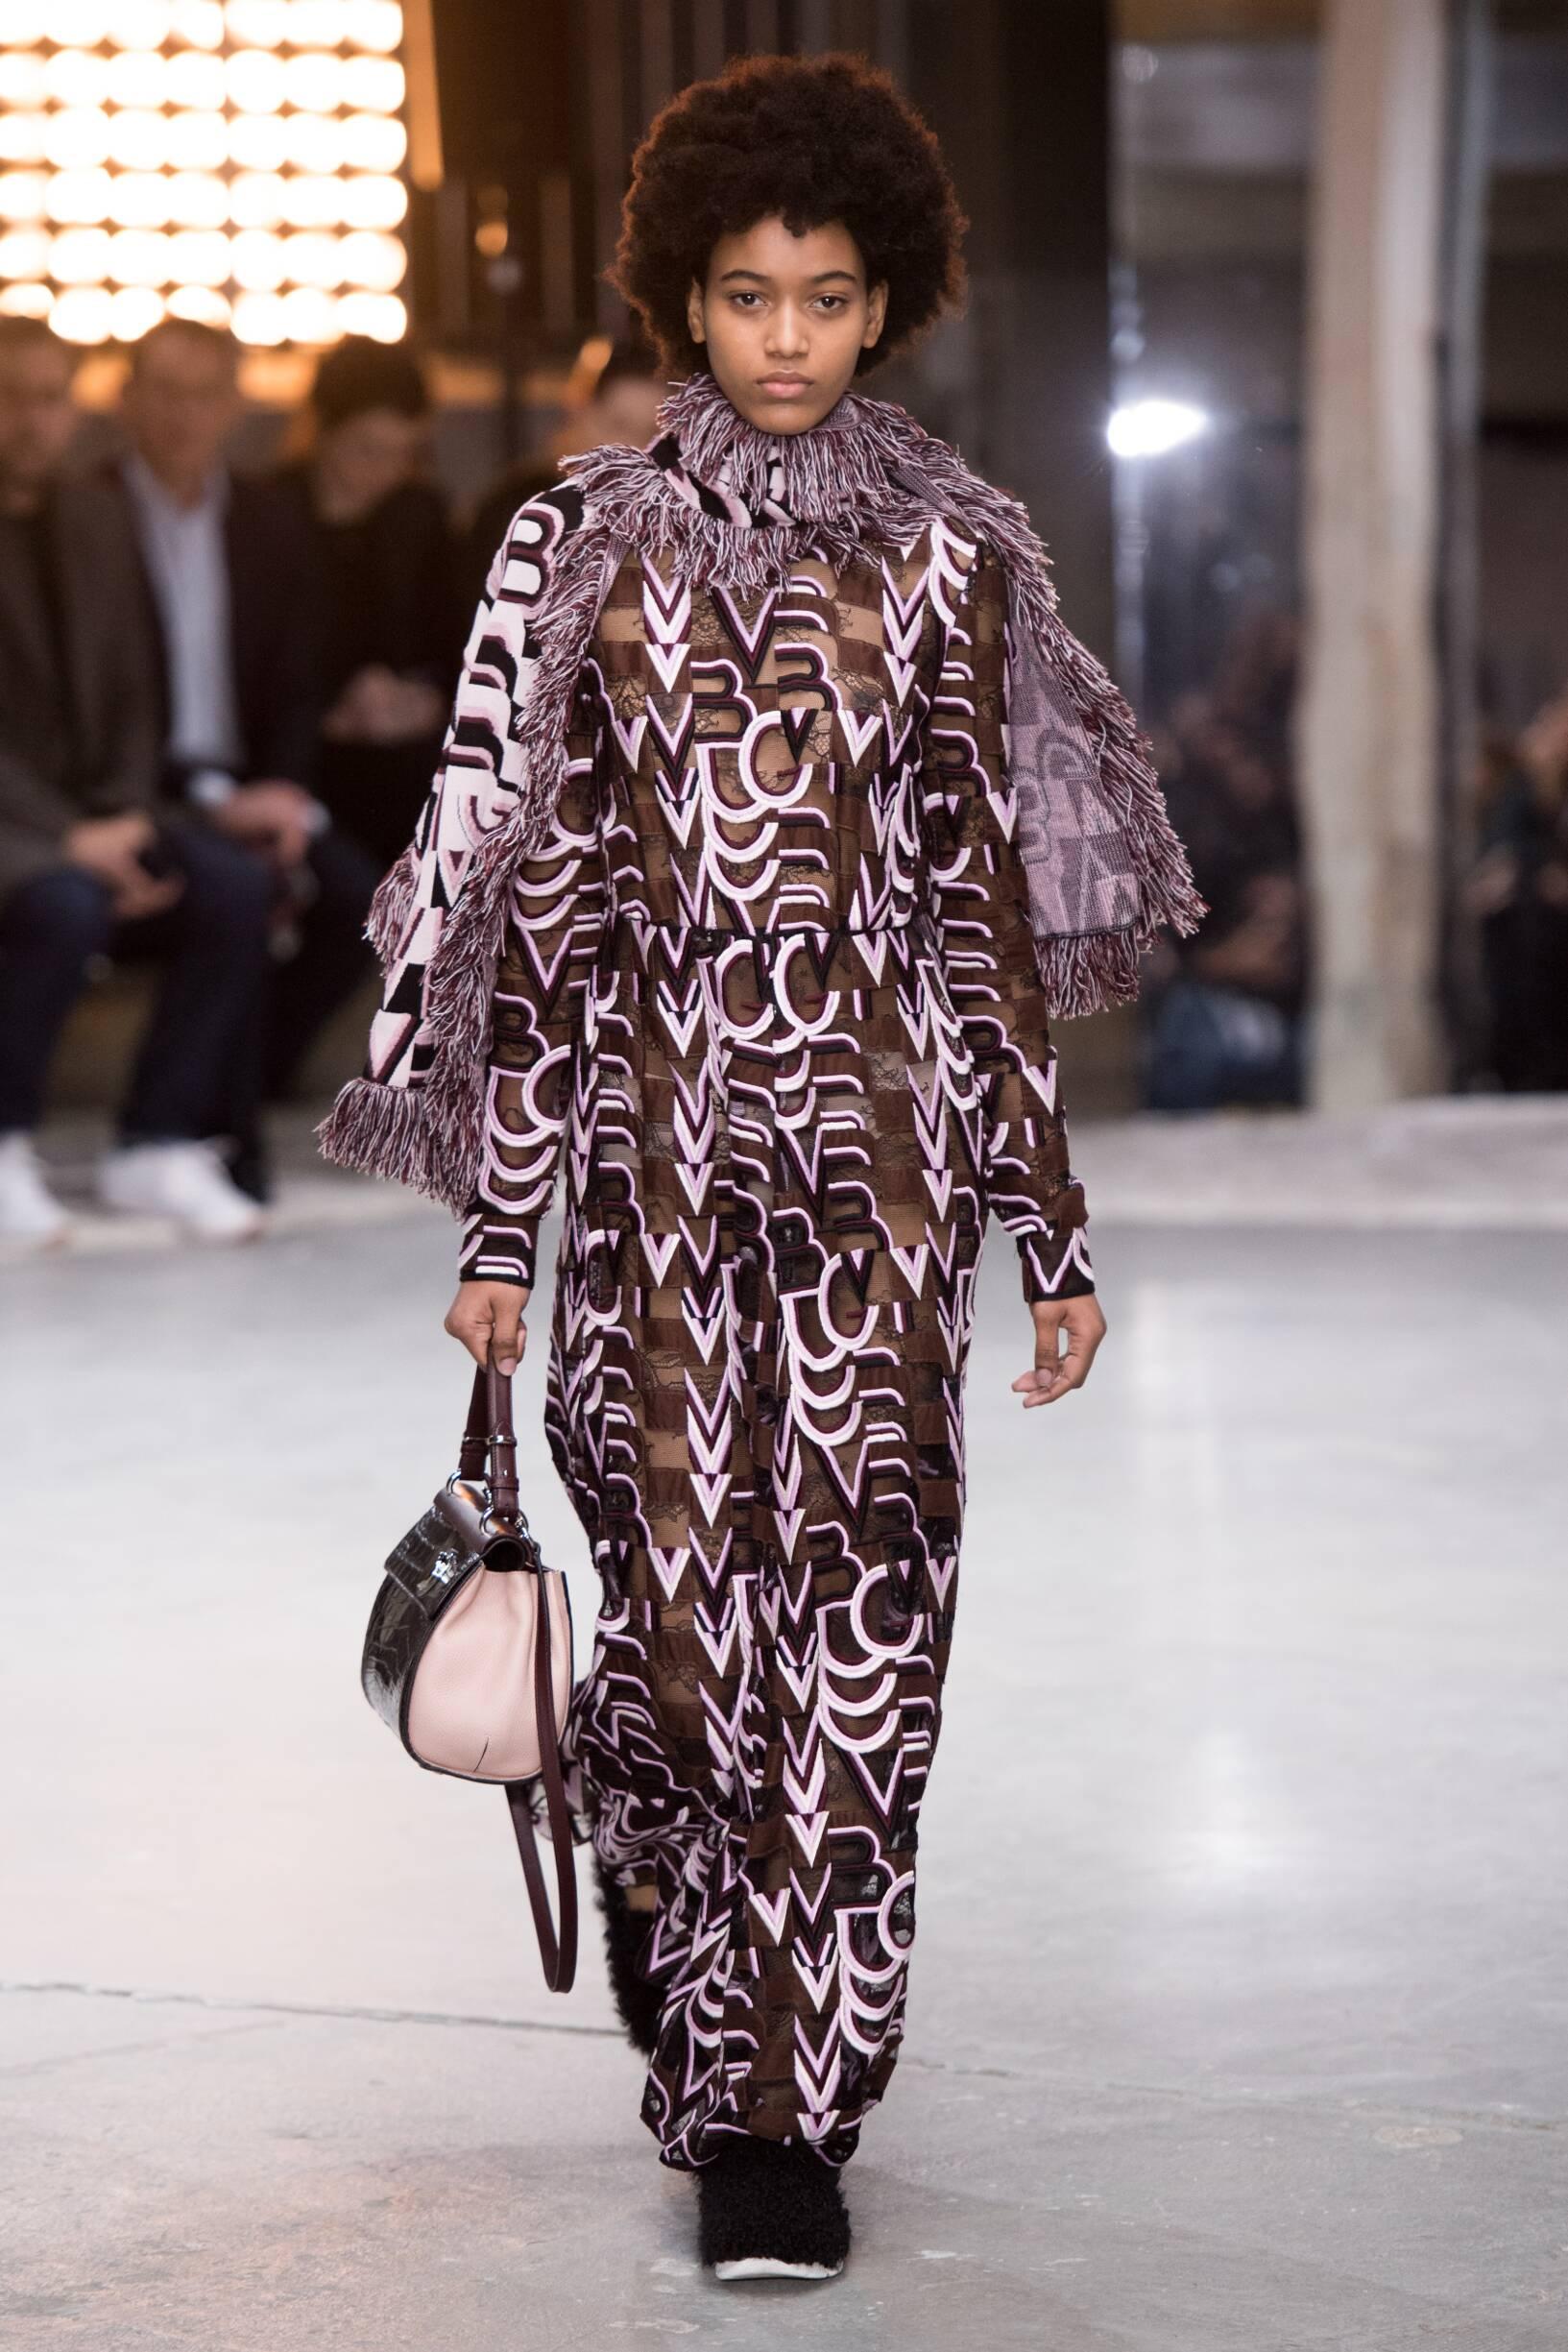 Fall Fashion Woman Trends 2018 Giambattista Valli